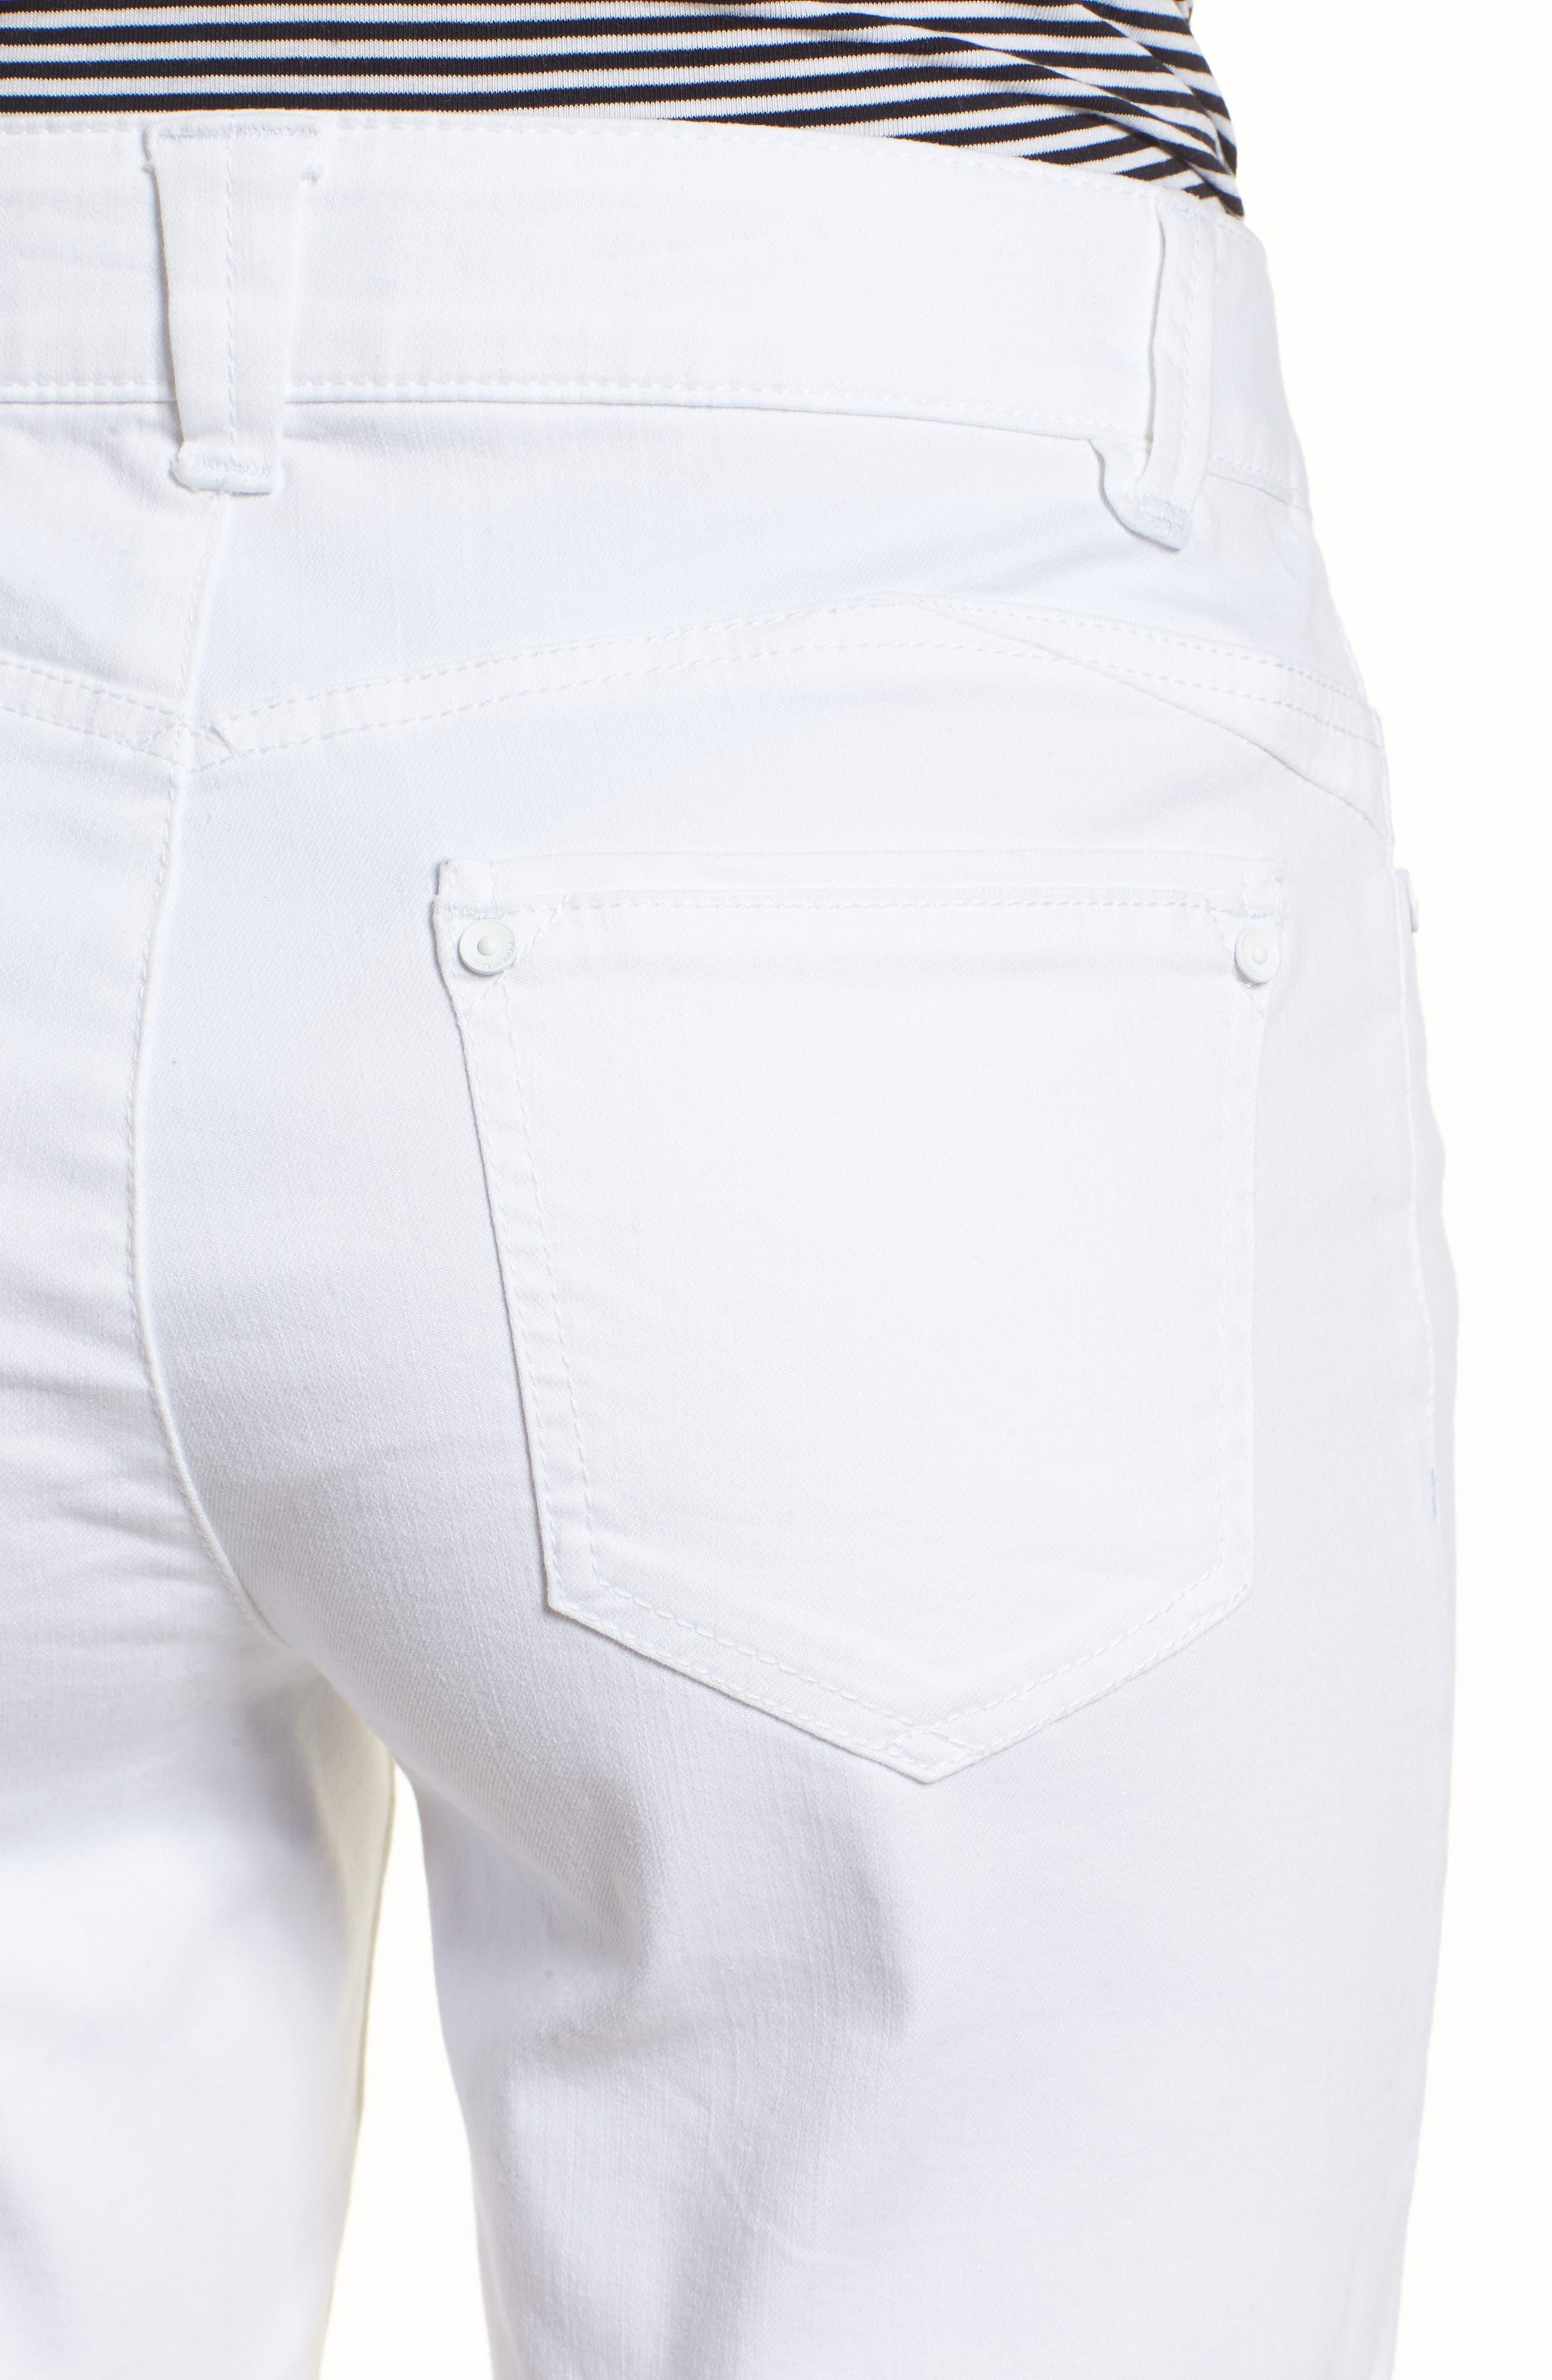 WIT & WISDOM, Ab-Solution White Denim Shorts, Alternate thumbnail 5, color, OPTIC WHITE